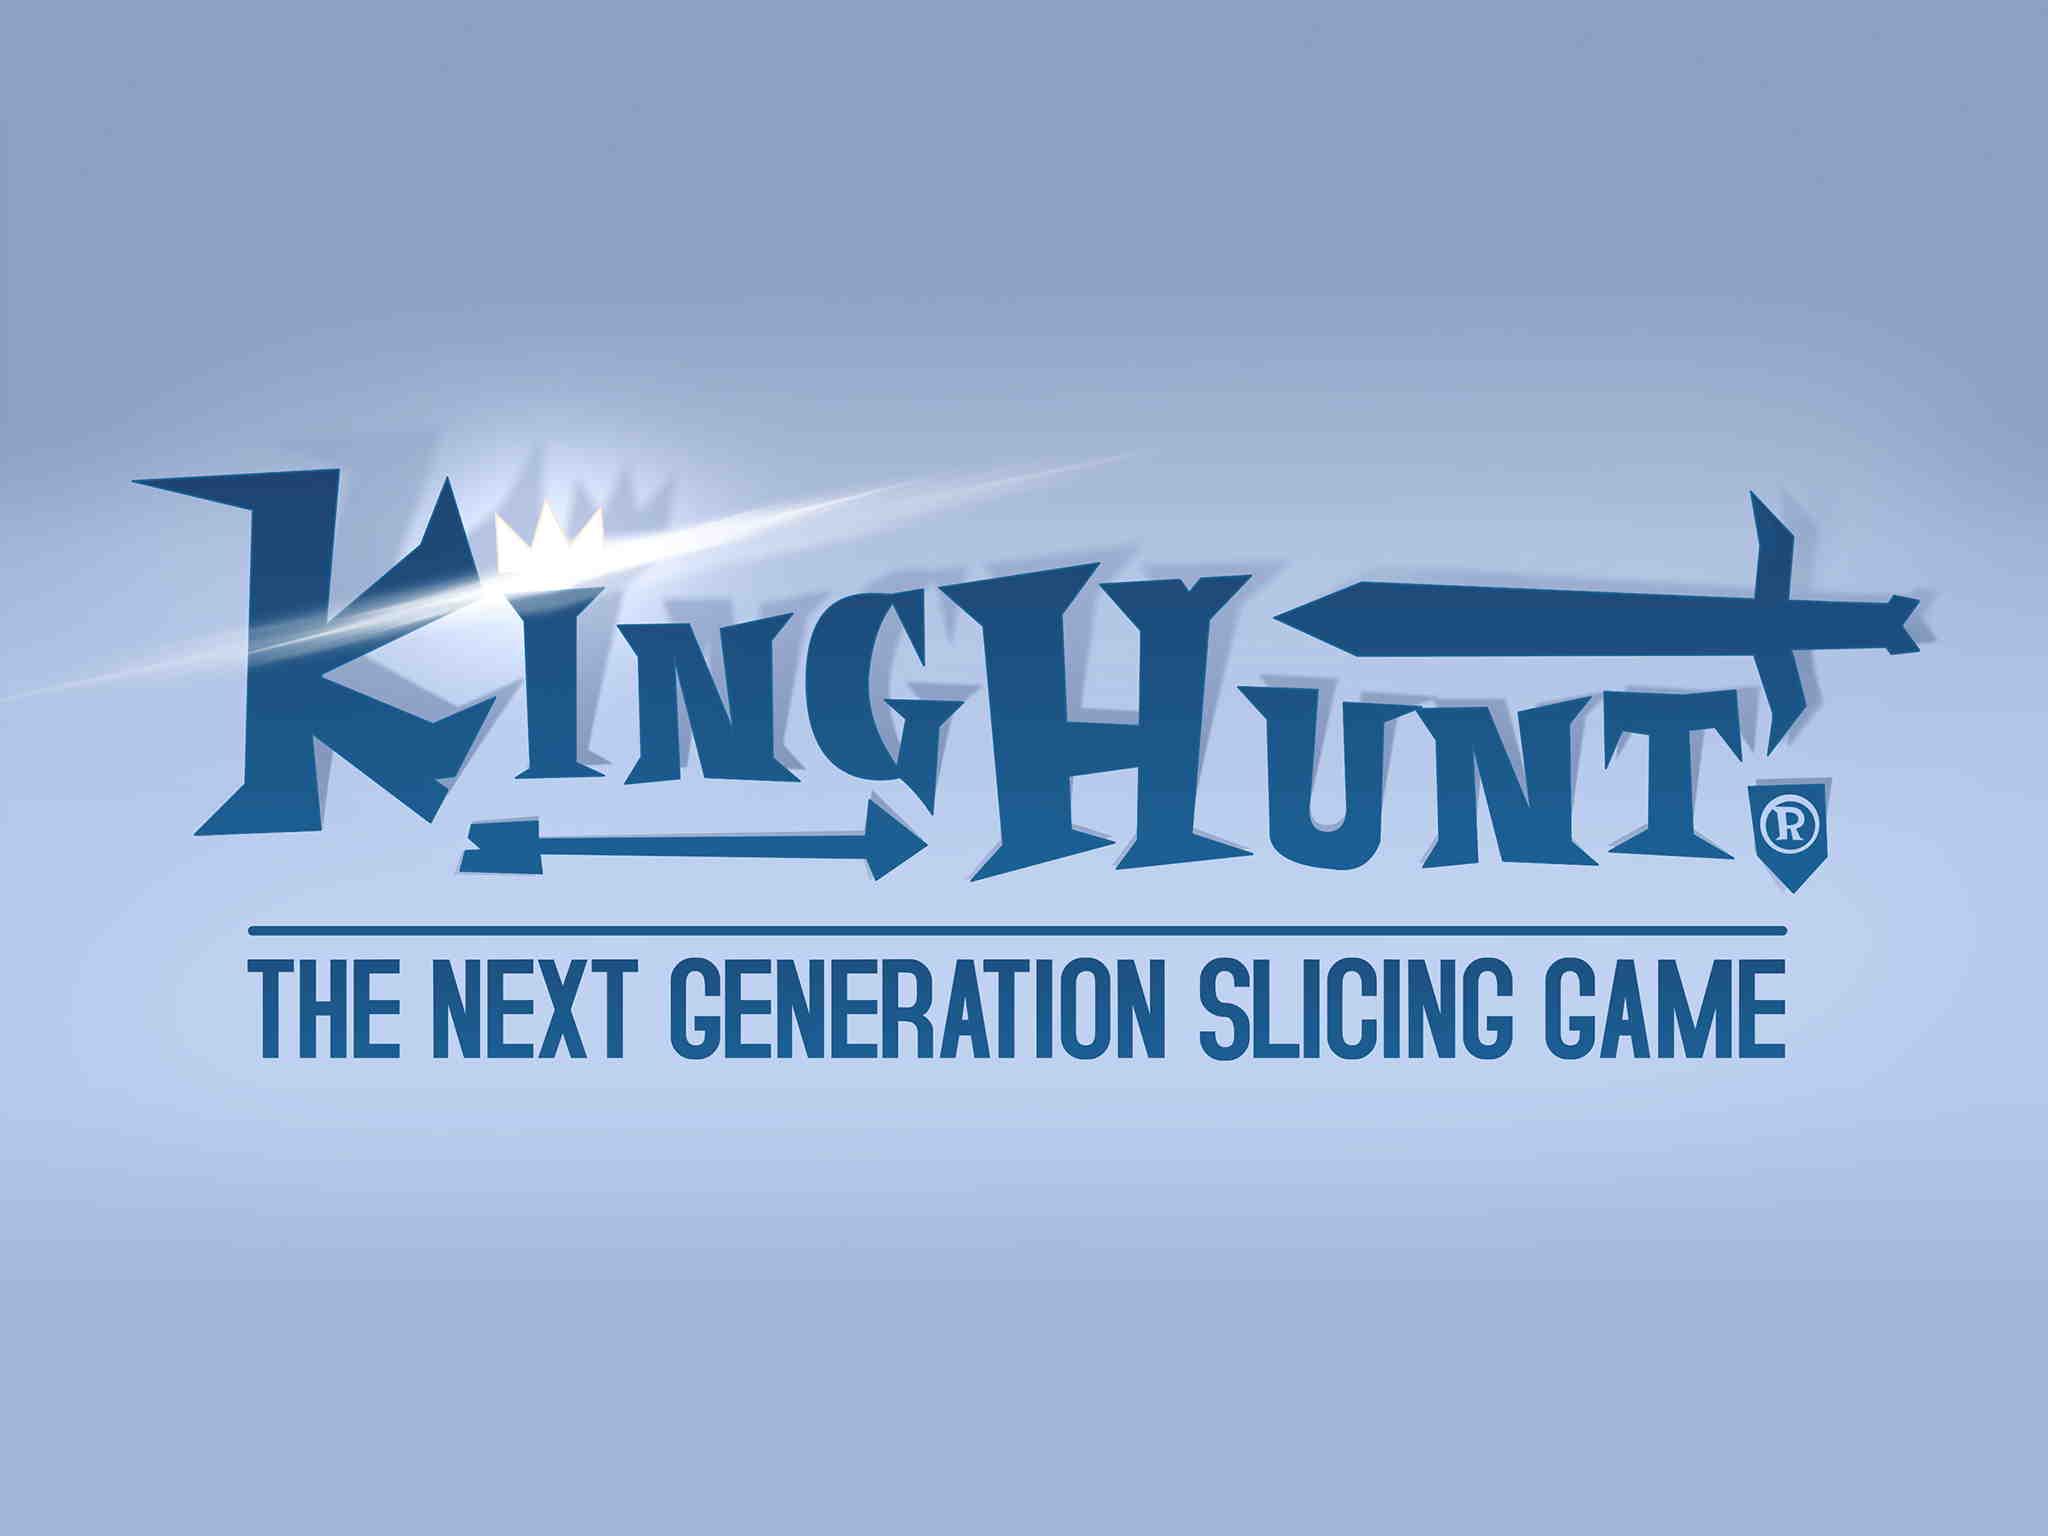 KingsHunt_01